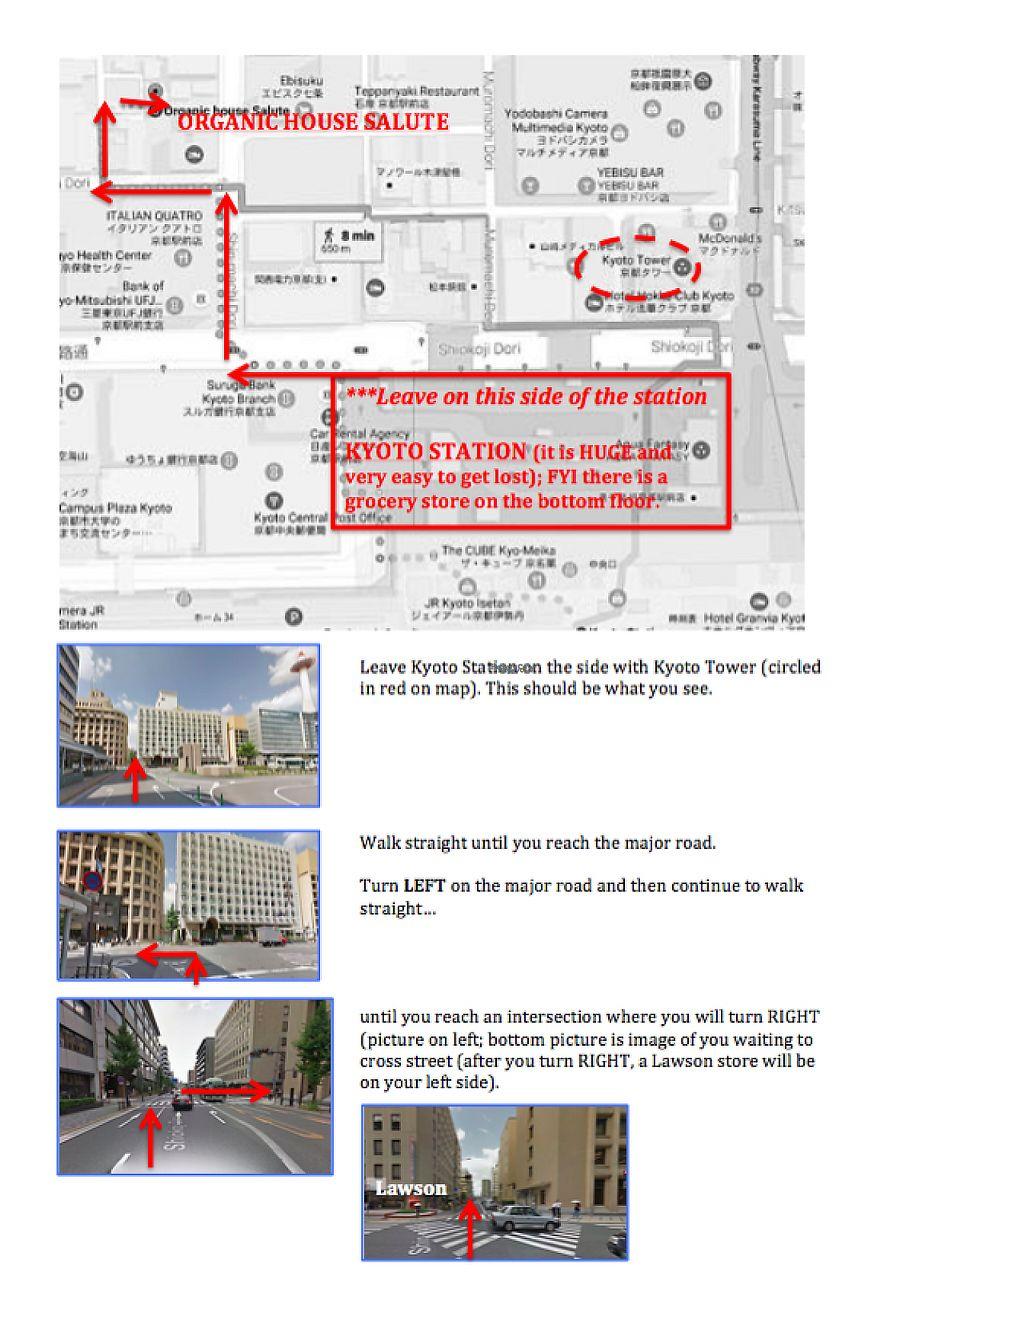 "Photo of Organic House Salute  by <a href=""/members/profile/alexanderamanda88"">alexanderamanda88</a> <br/>Directions to Organic House Salute from Kyoto Station- page 1 <br/> February 4, 2017  - <a href='/contact/abuse/image/43818/222413'>Report</a>"